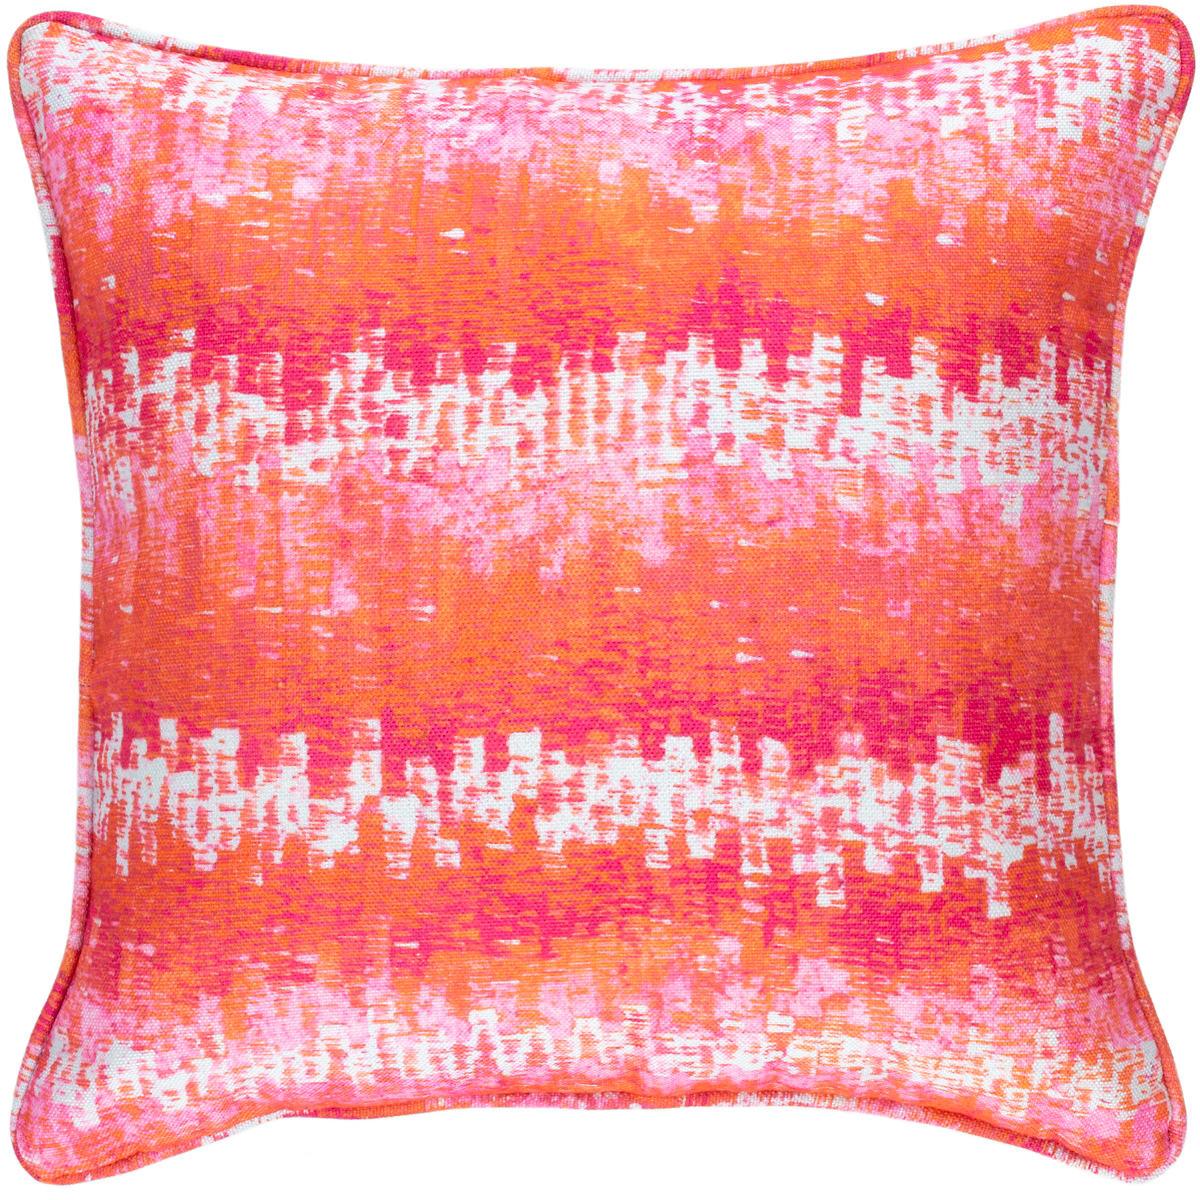 Maldives Pink Indoor/Outdoor Decorative Pillow